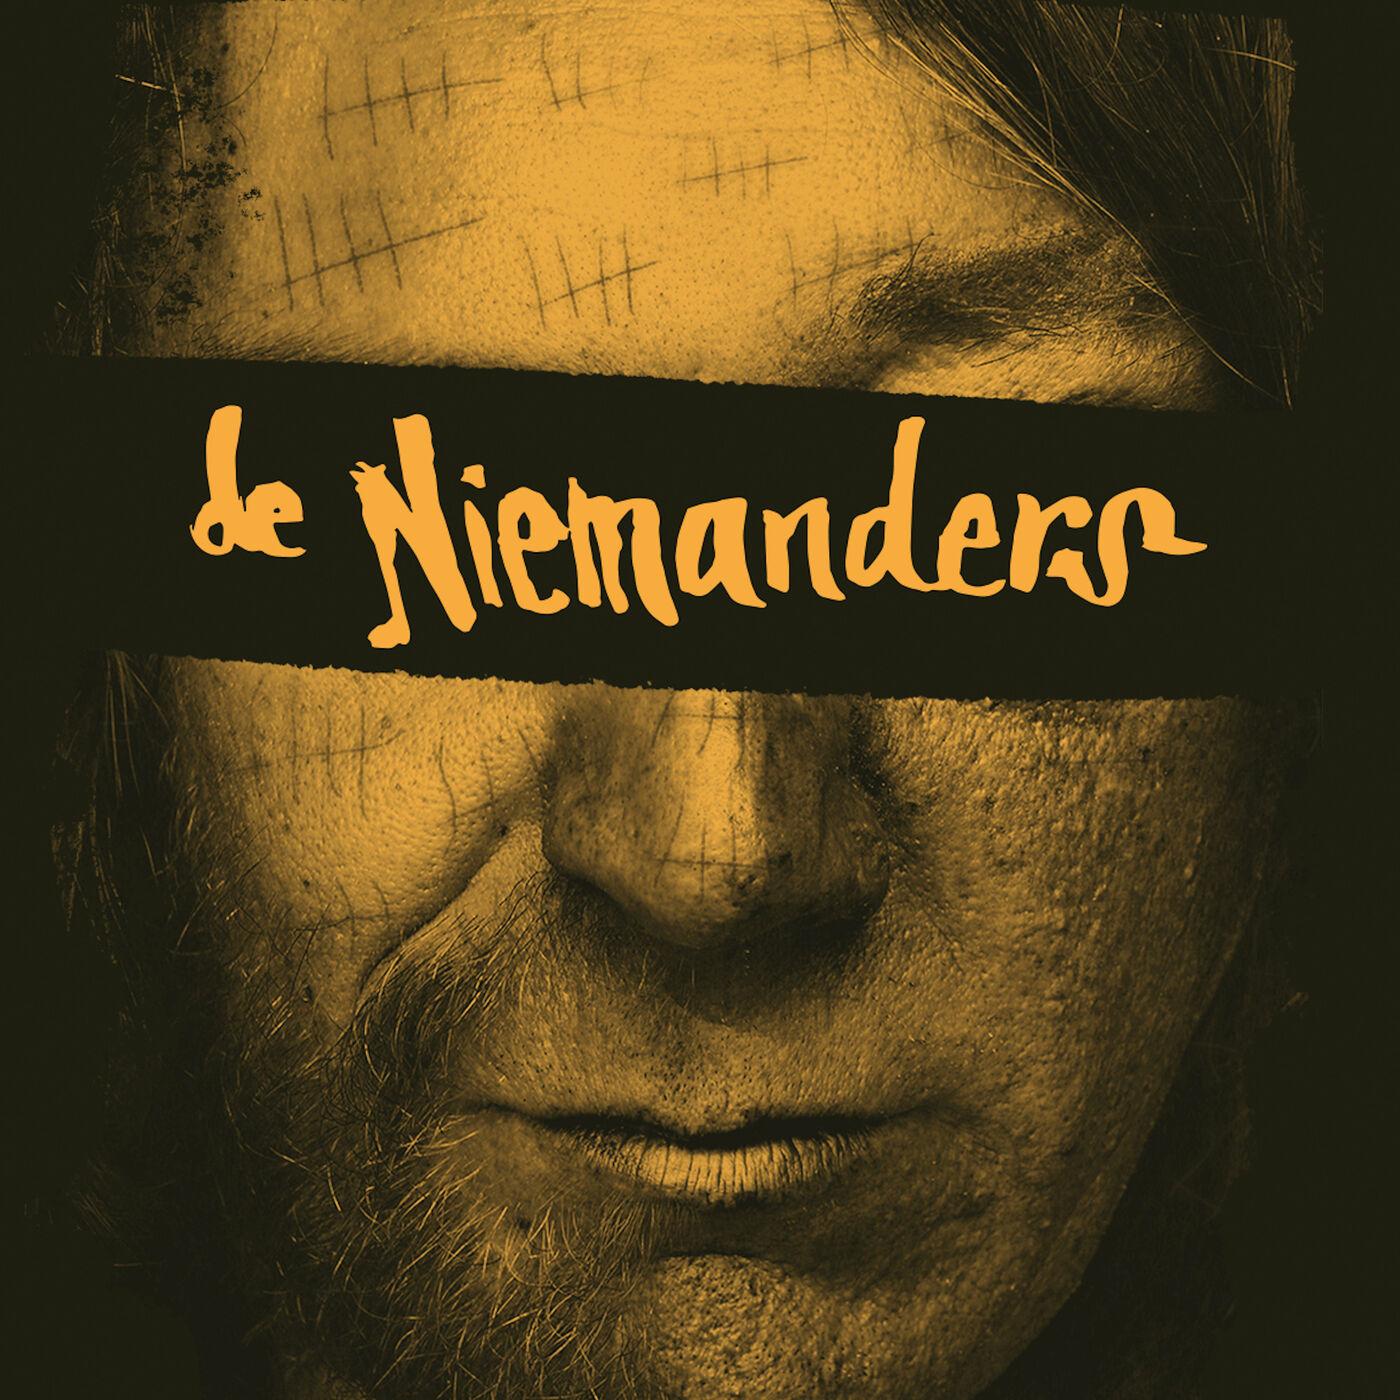 De Niemanders logo